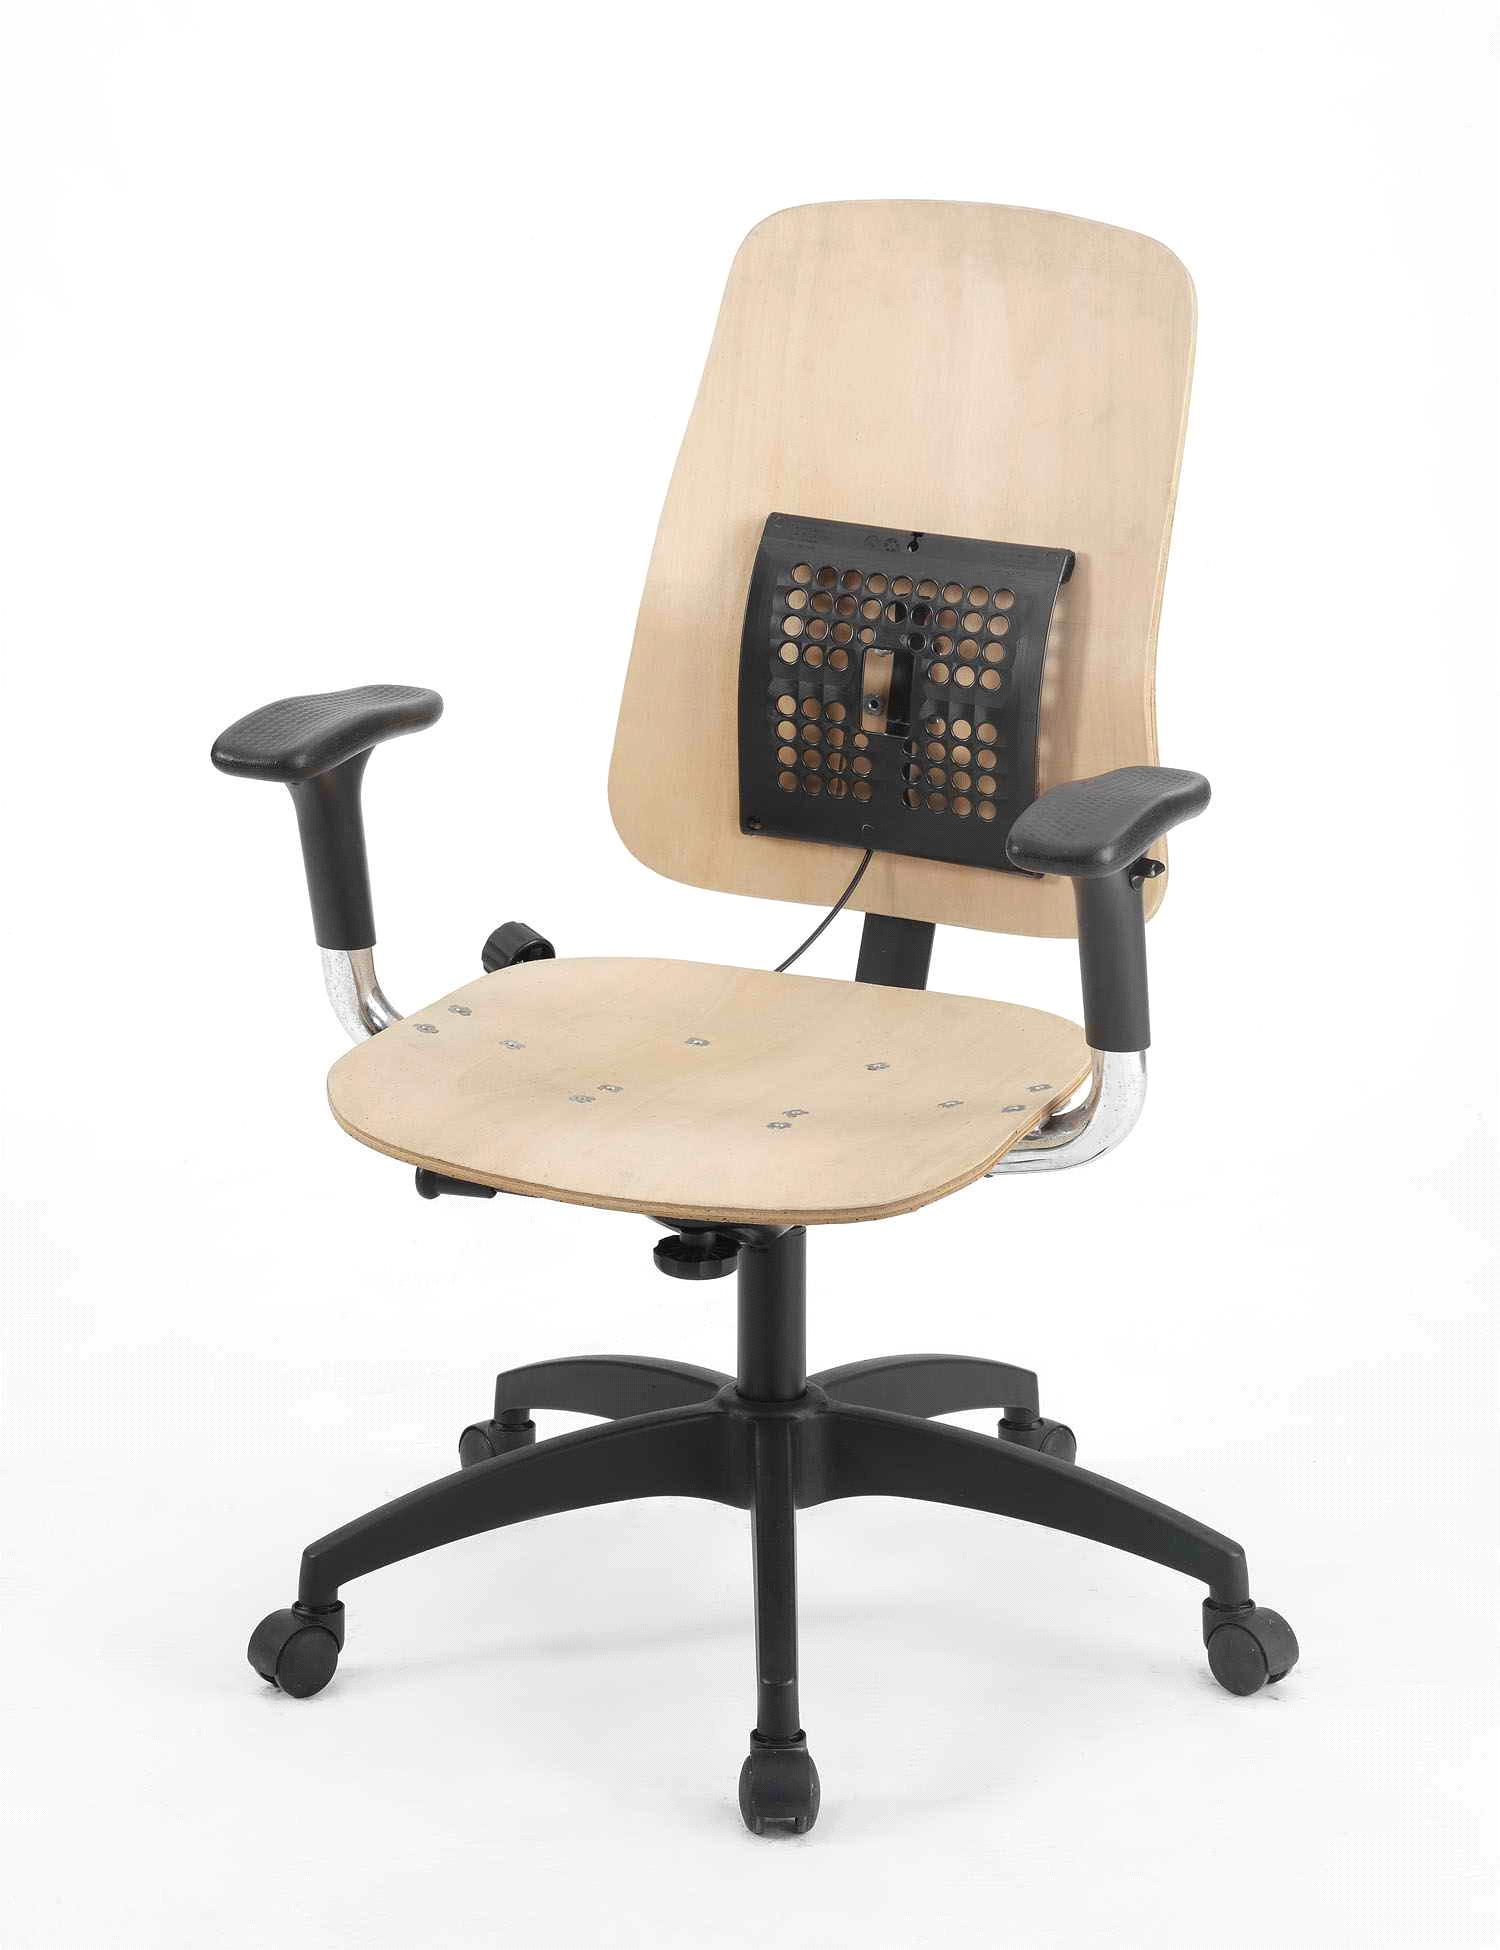 CH-601-HBAjustable Lumbar Support Mechanism for Office Chair  sc 1 st  ECVV.com & CH-601-HBAjustable Lumbar Support Mechanism for Office Chair ...